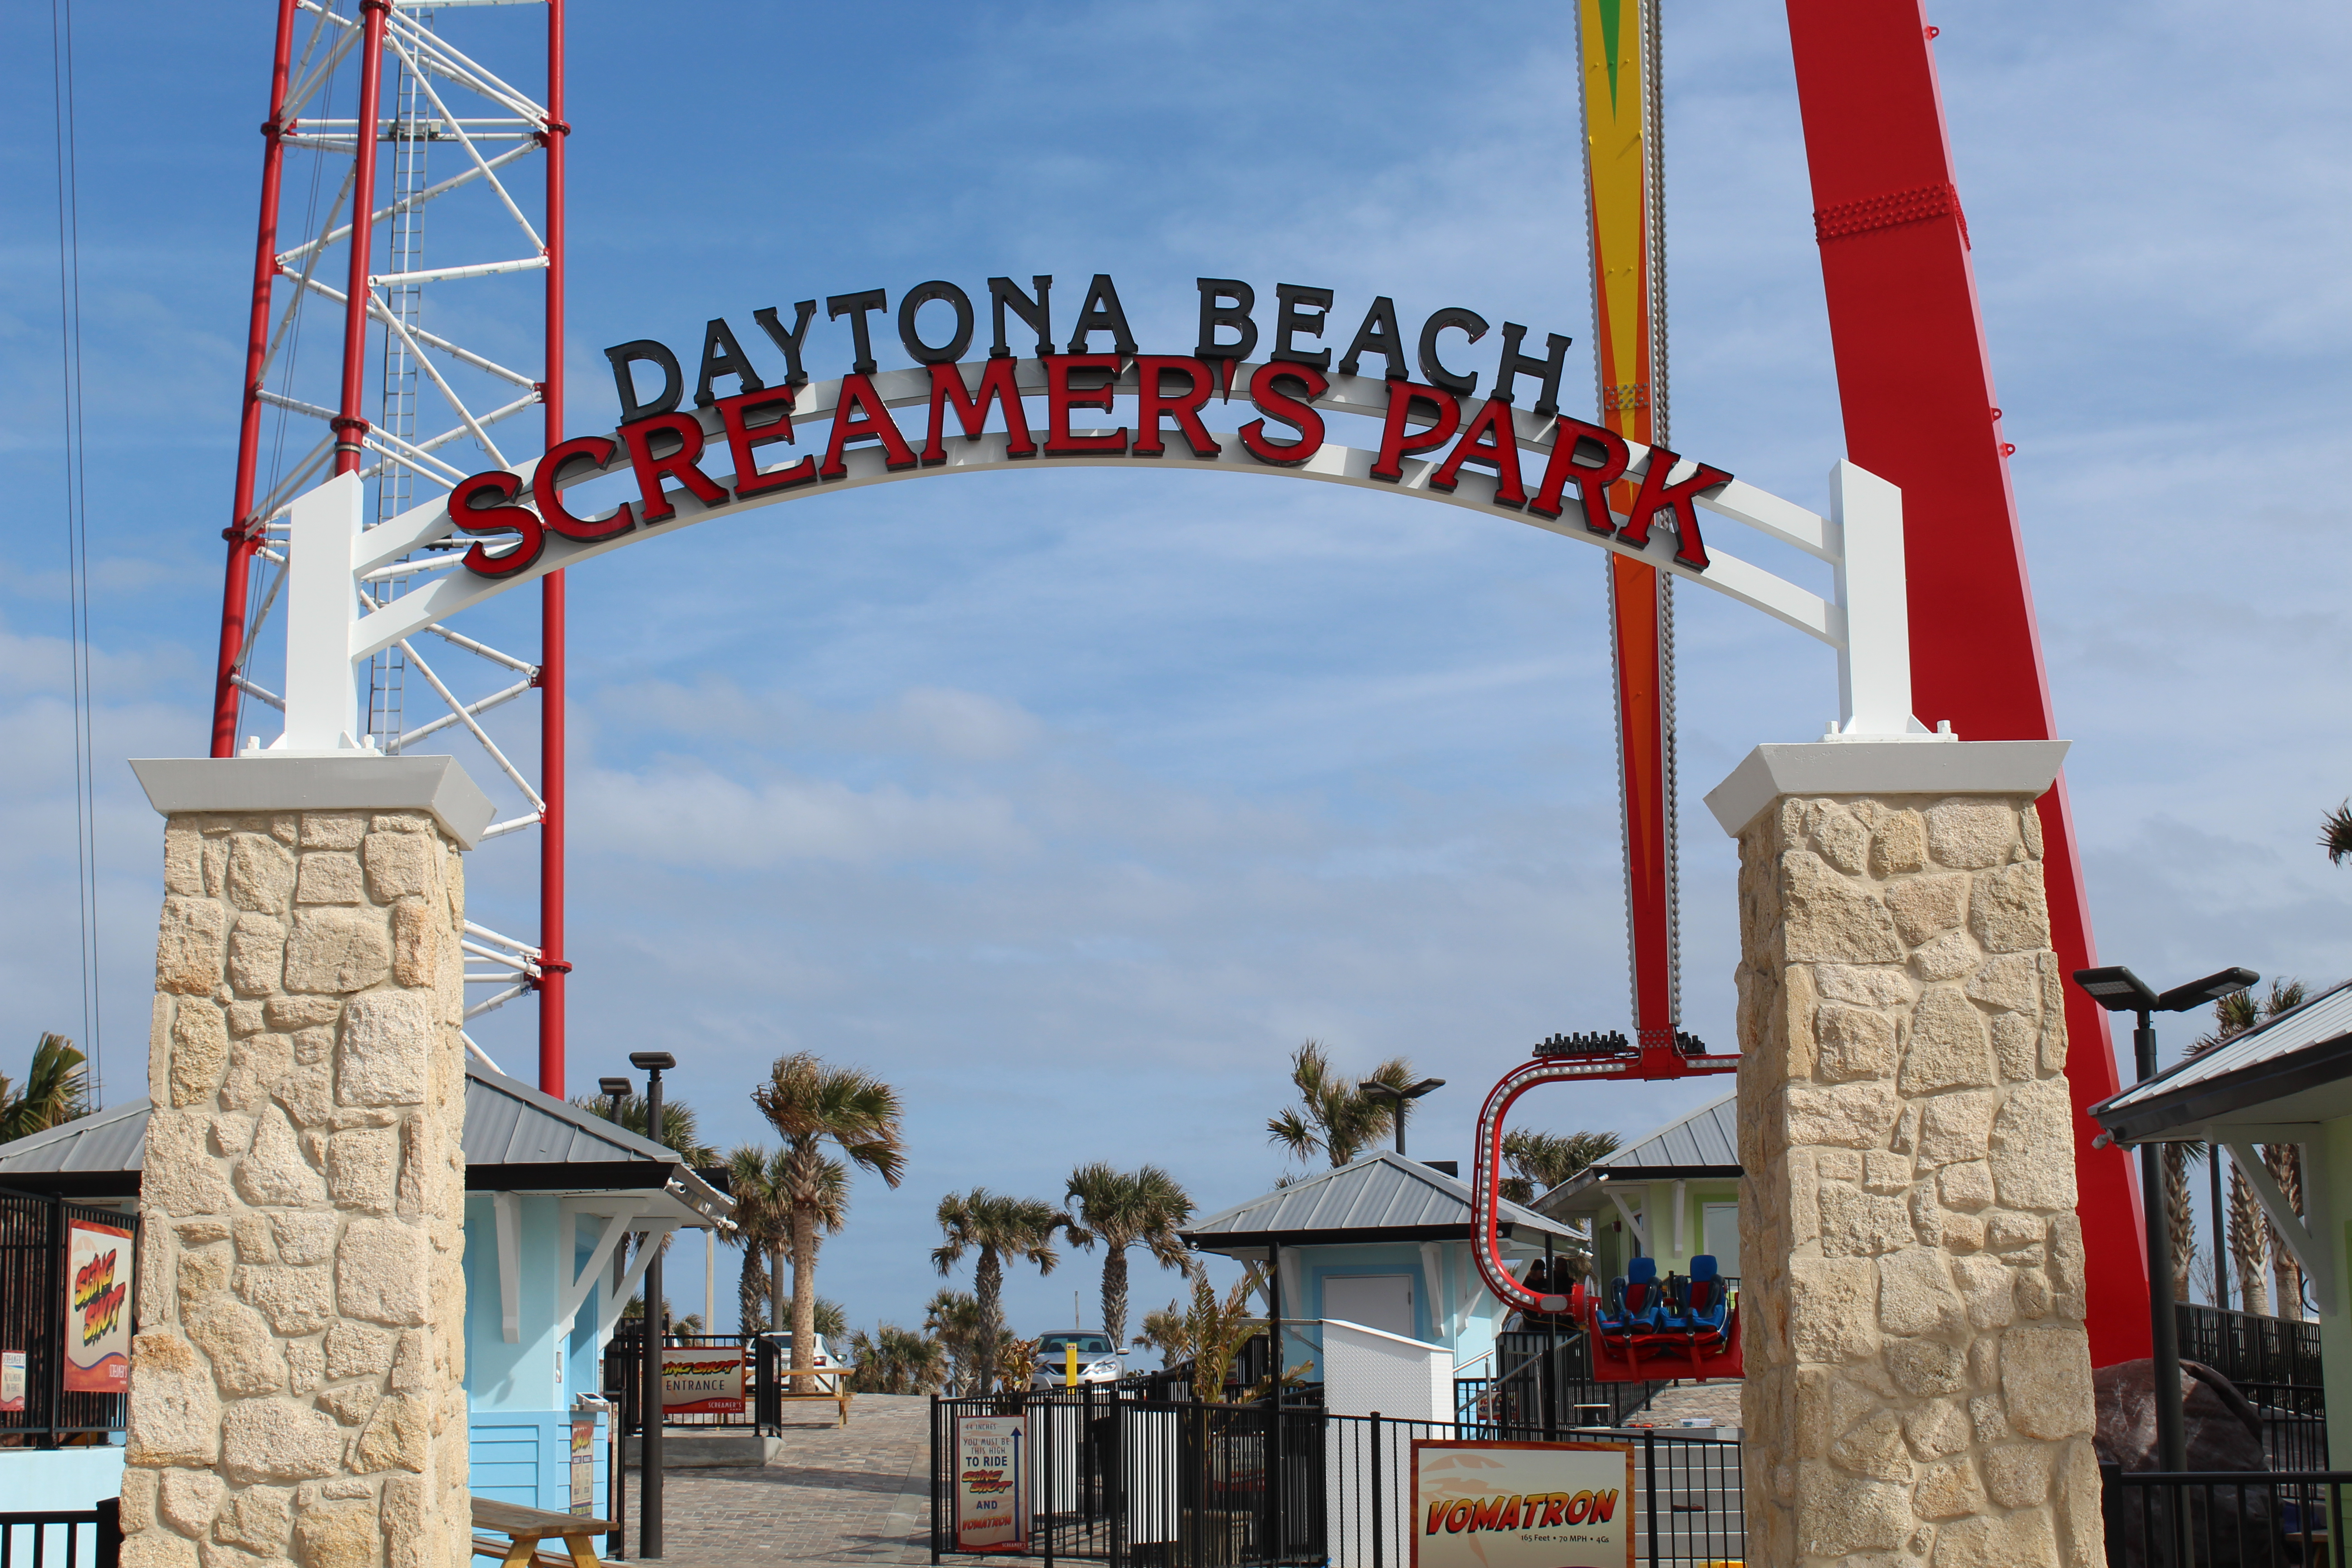 Daytona Boardwalk Slingshot Travel Guide